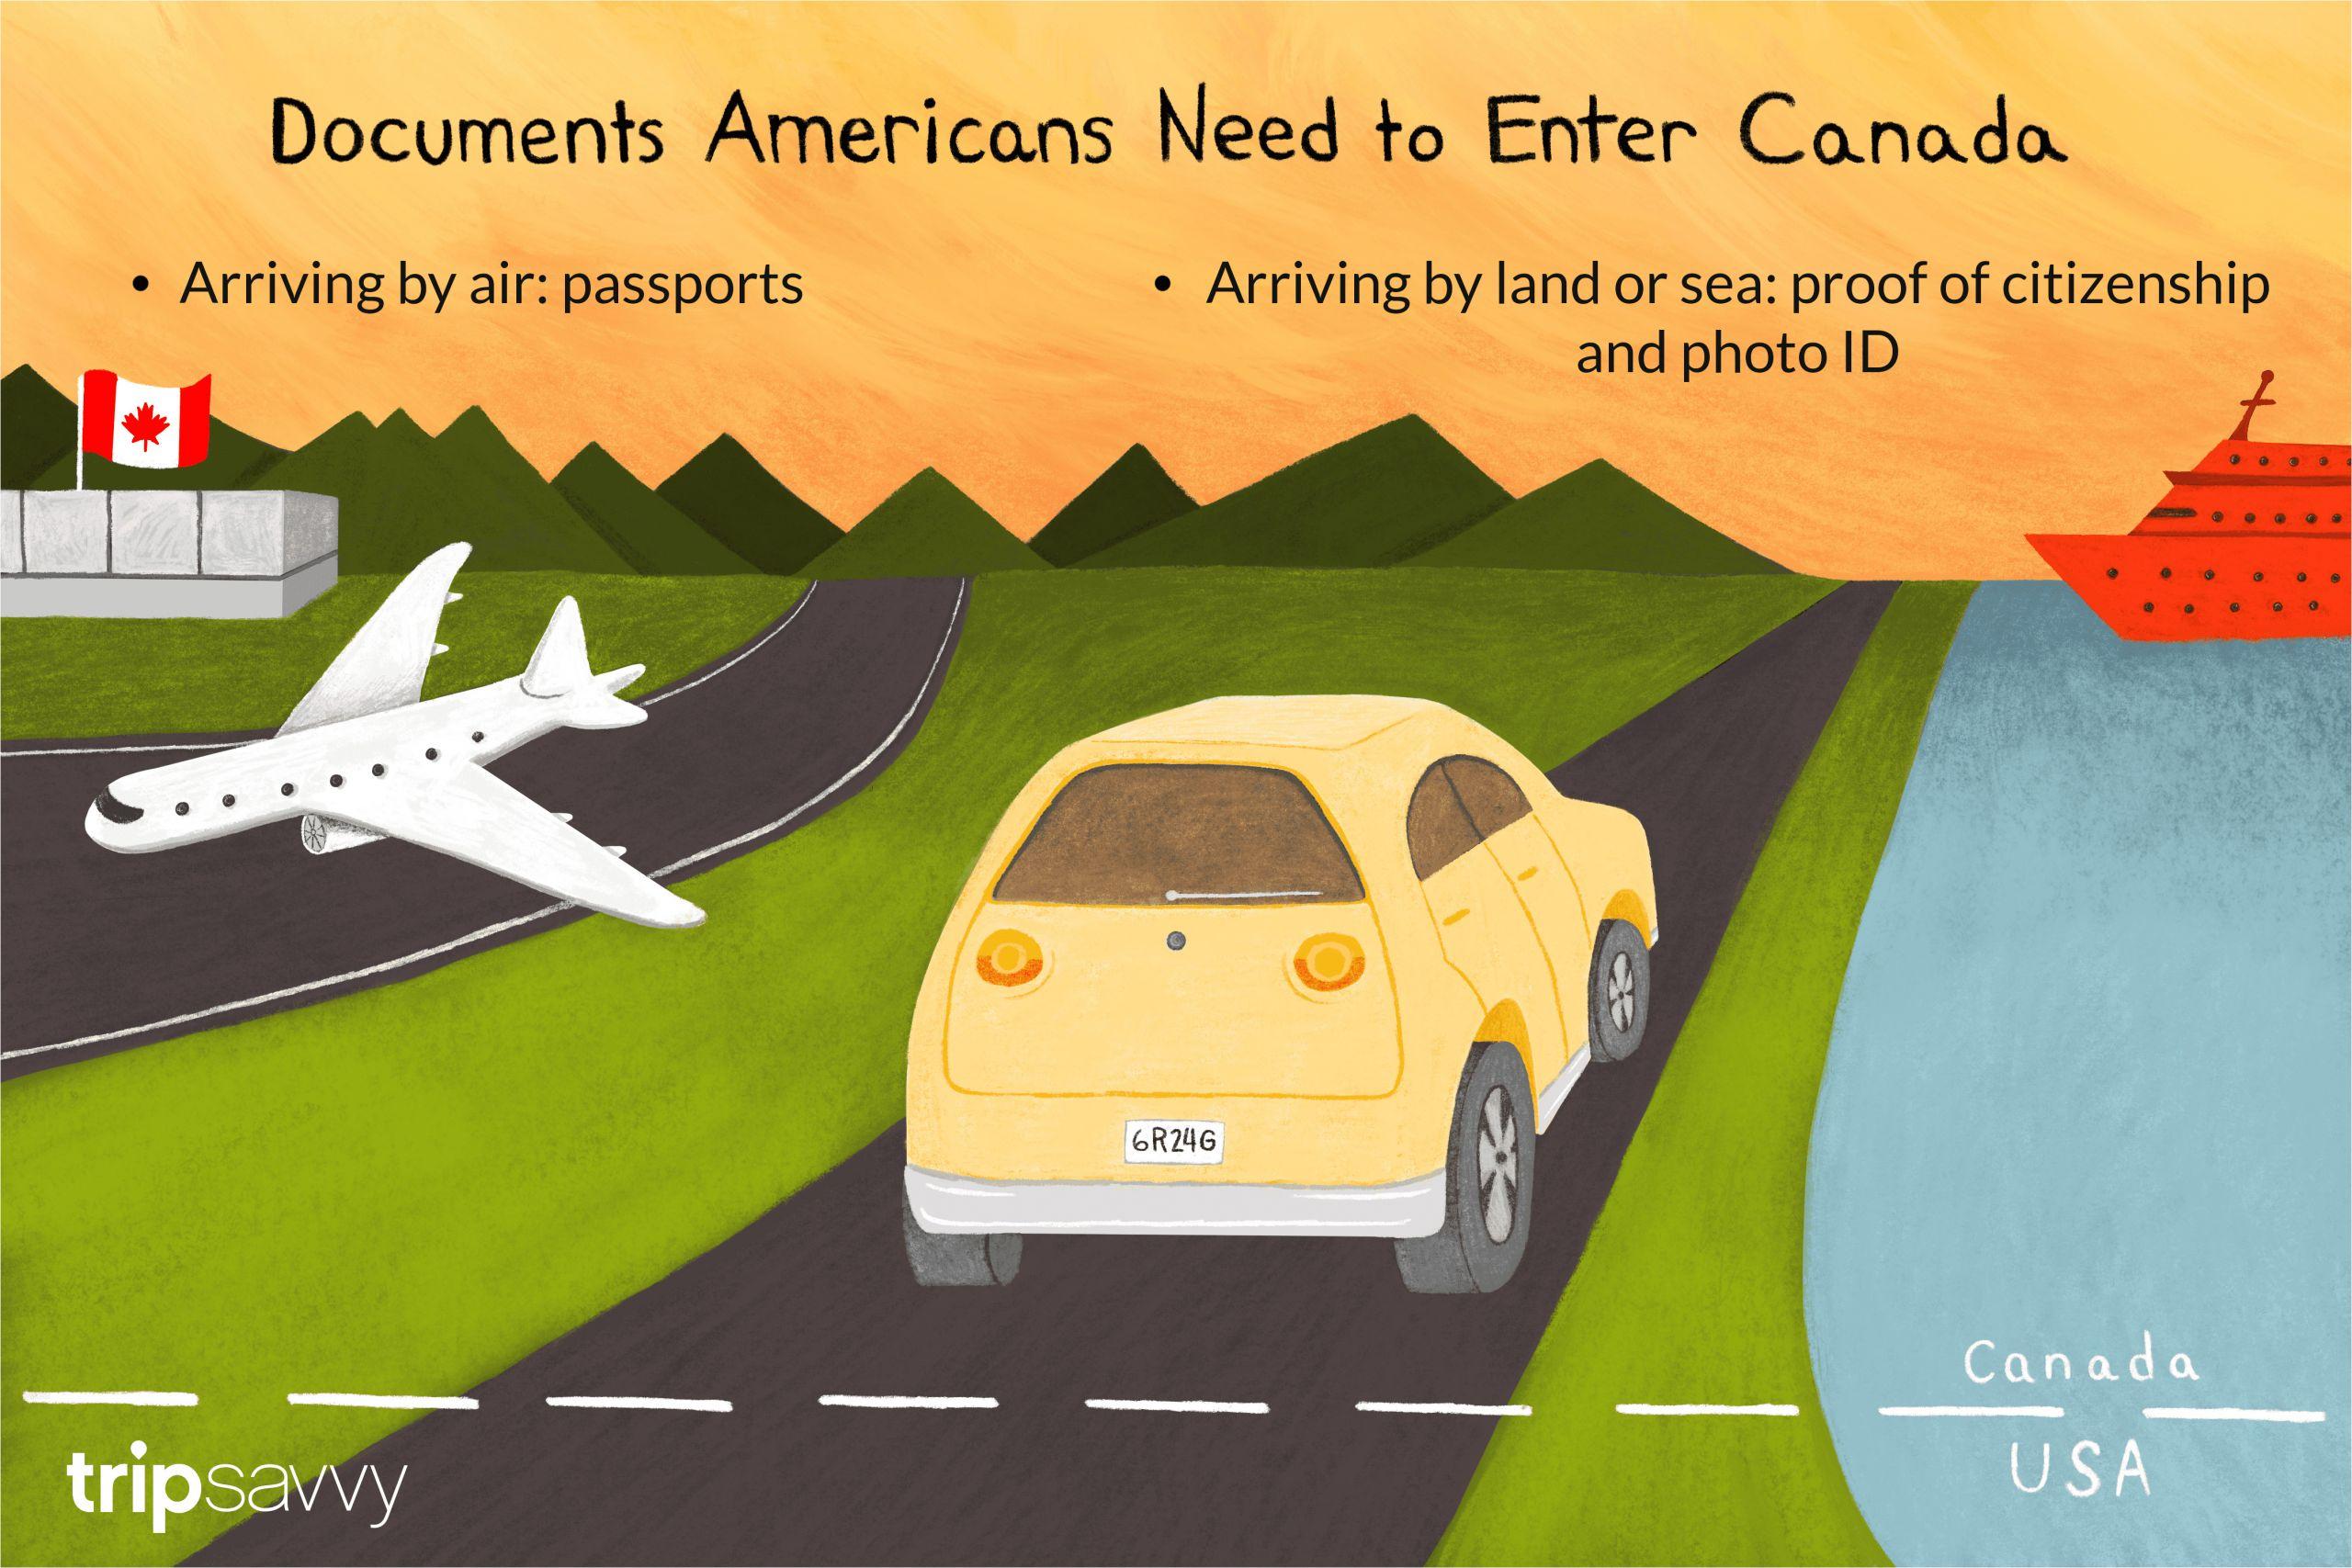 americans need passport to visit canada 1481664 v2 52647497ba3b40968363e7b043eaa06c png